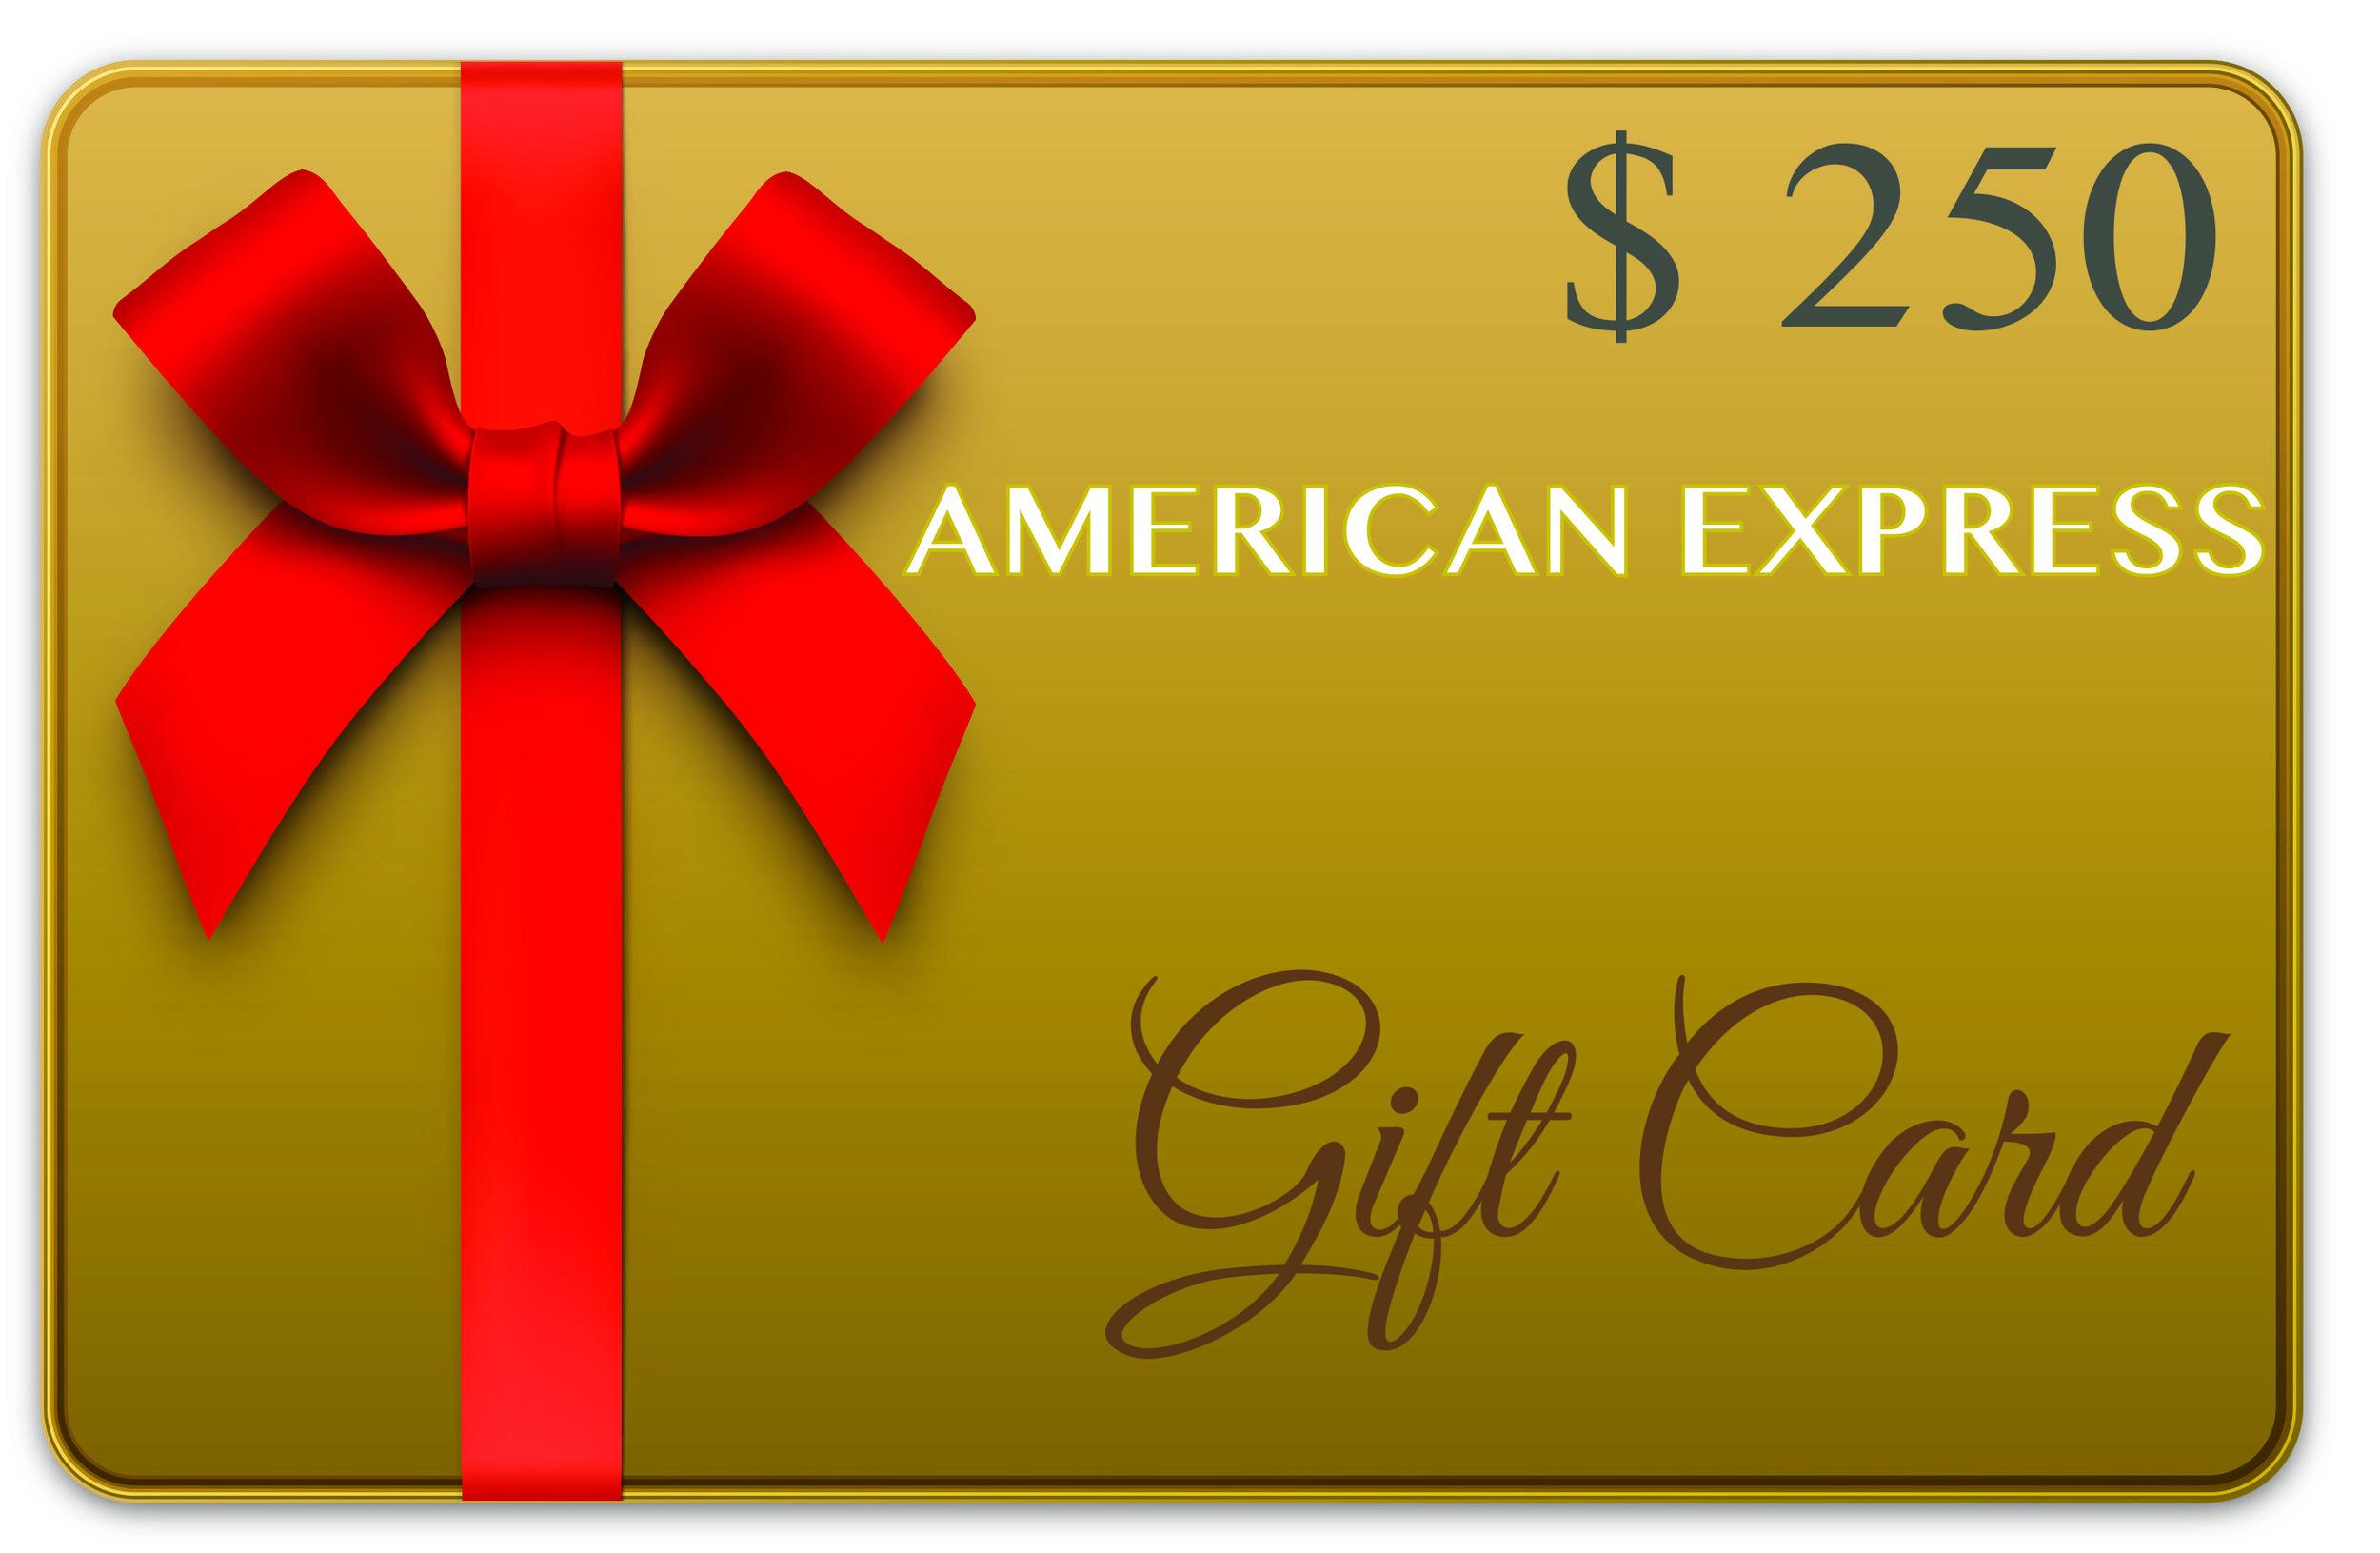 American Express Gift Card.jpg